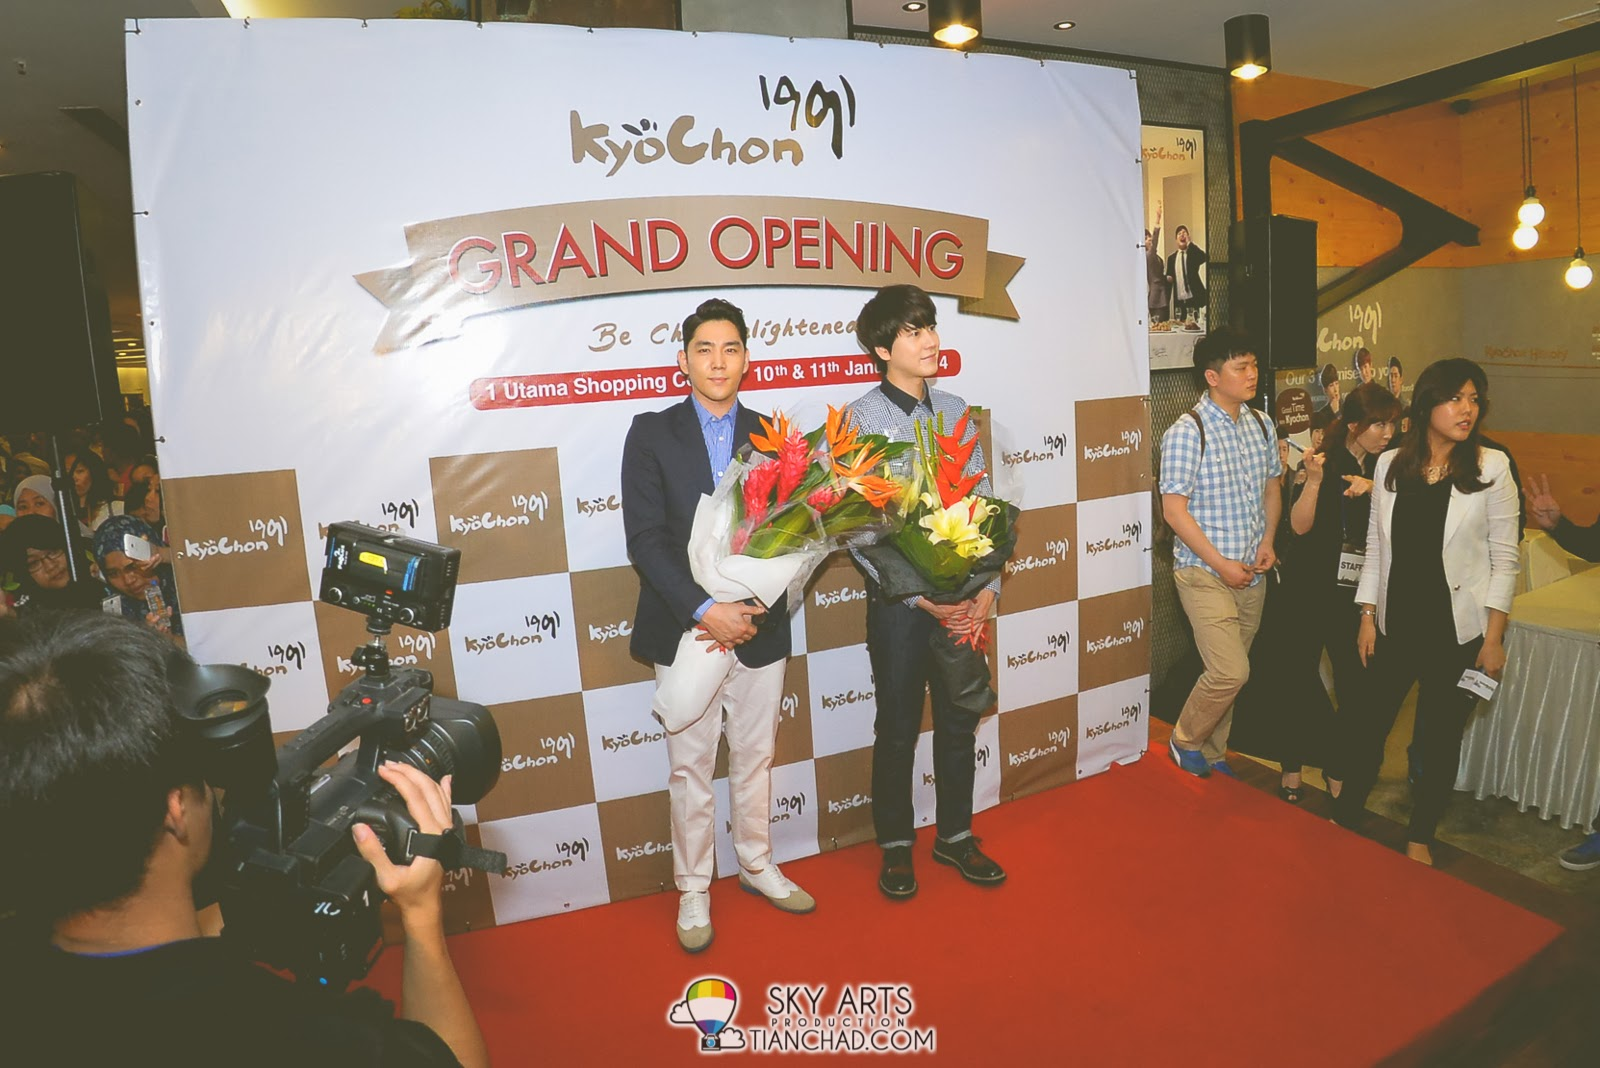 SuperJunior Kyuhyun & Kangin @ KyoChon Malaysia 1 Utama